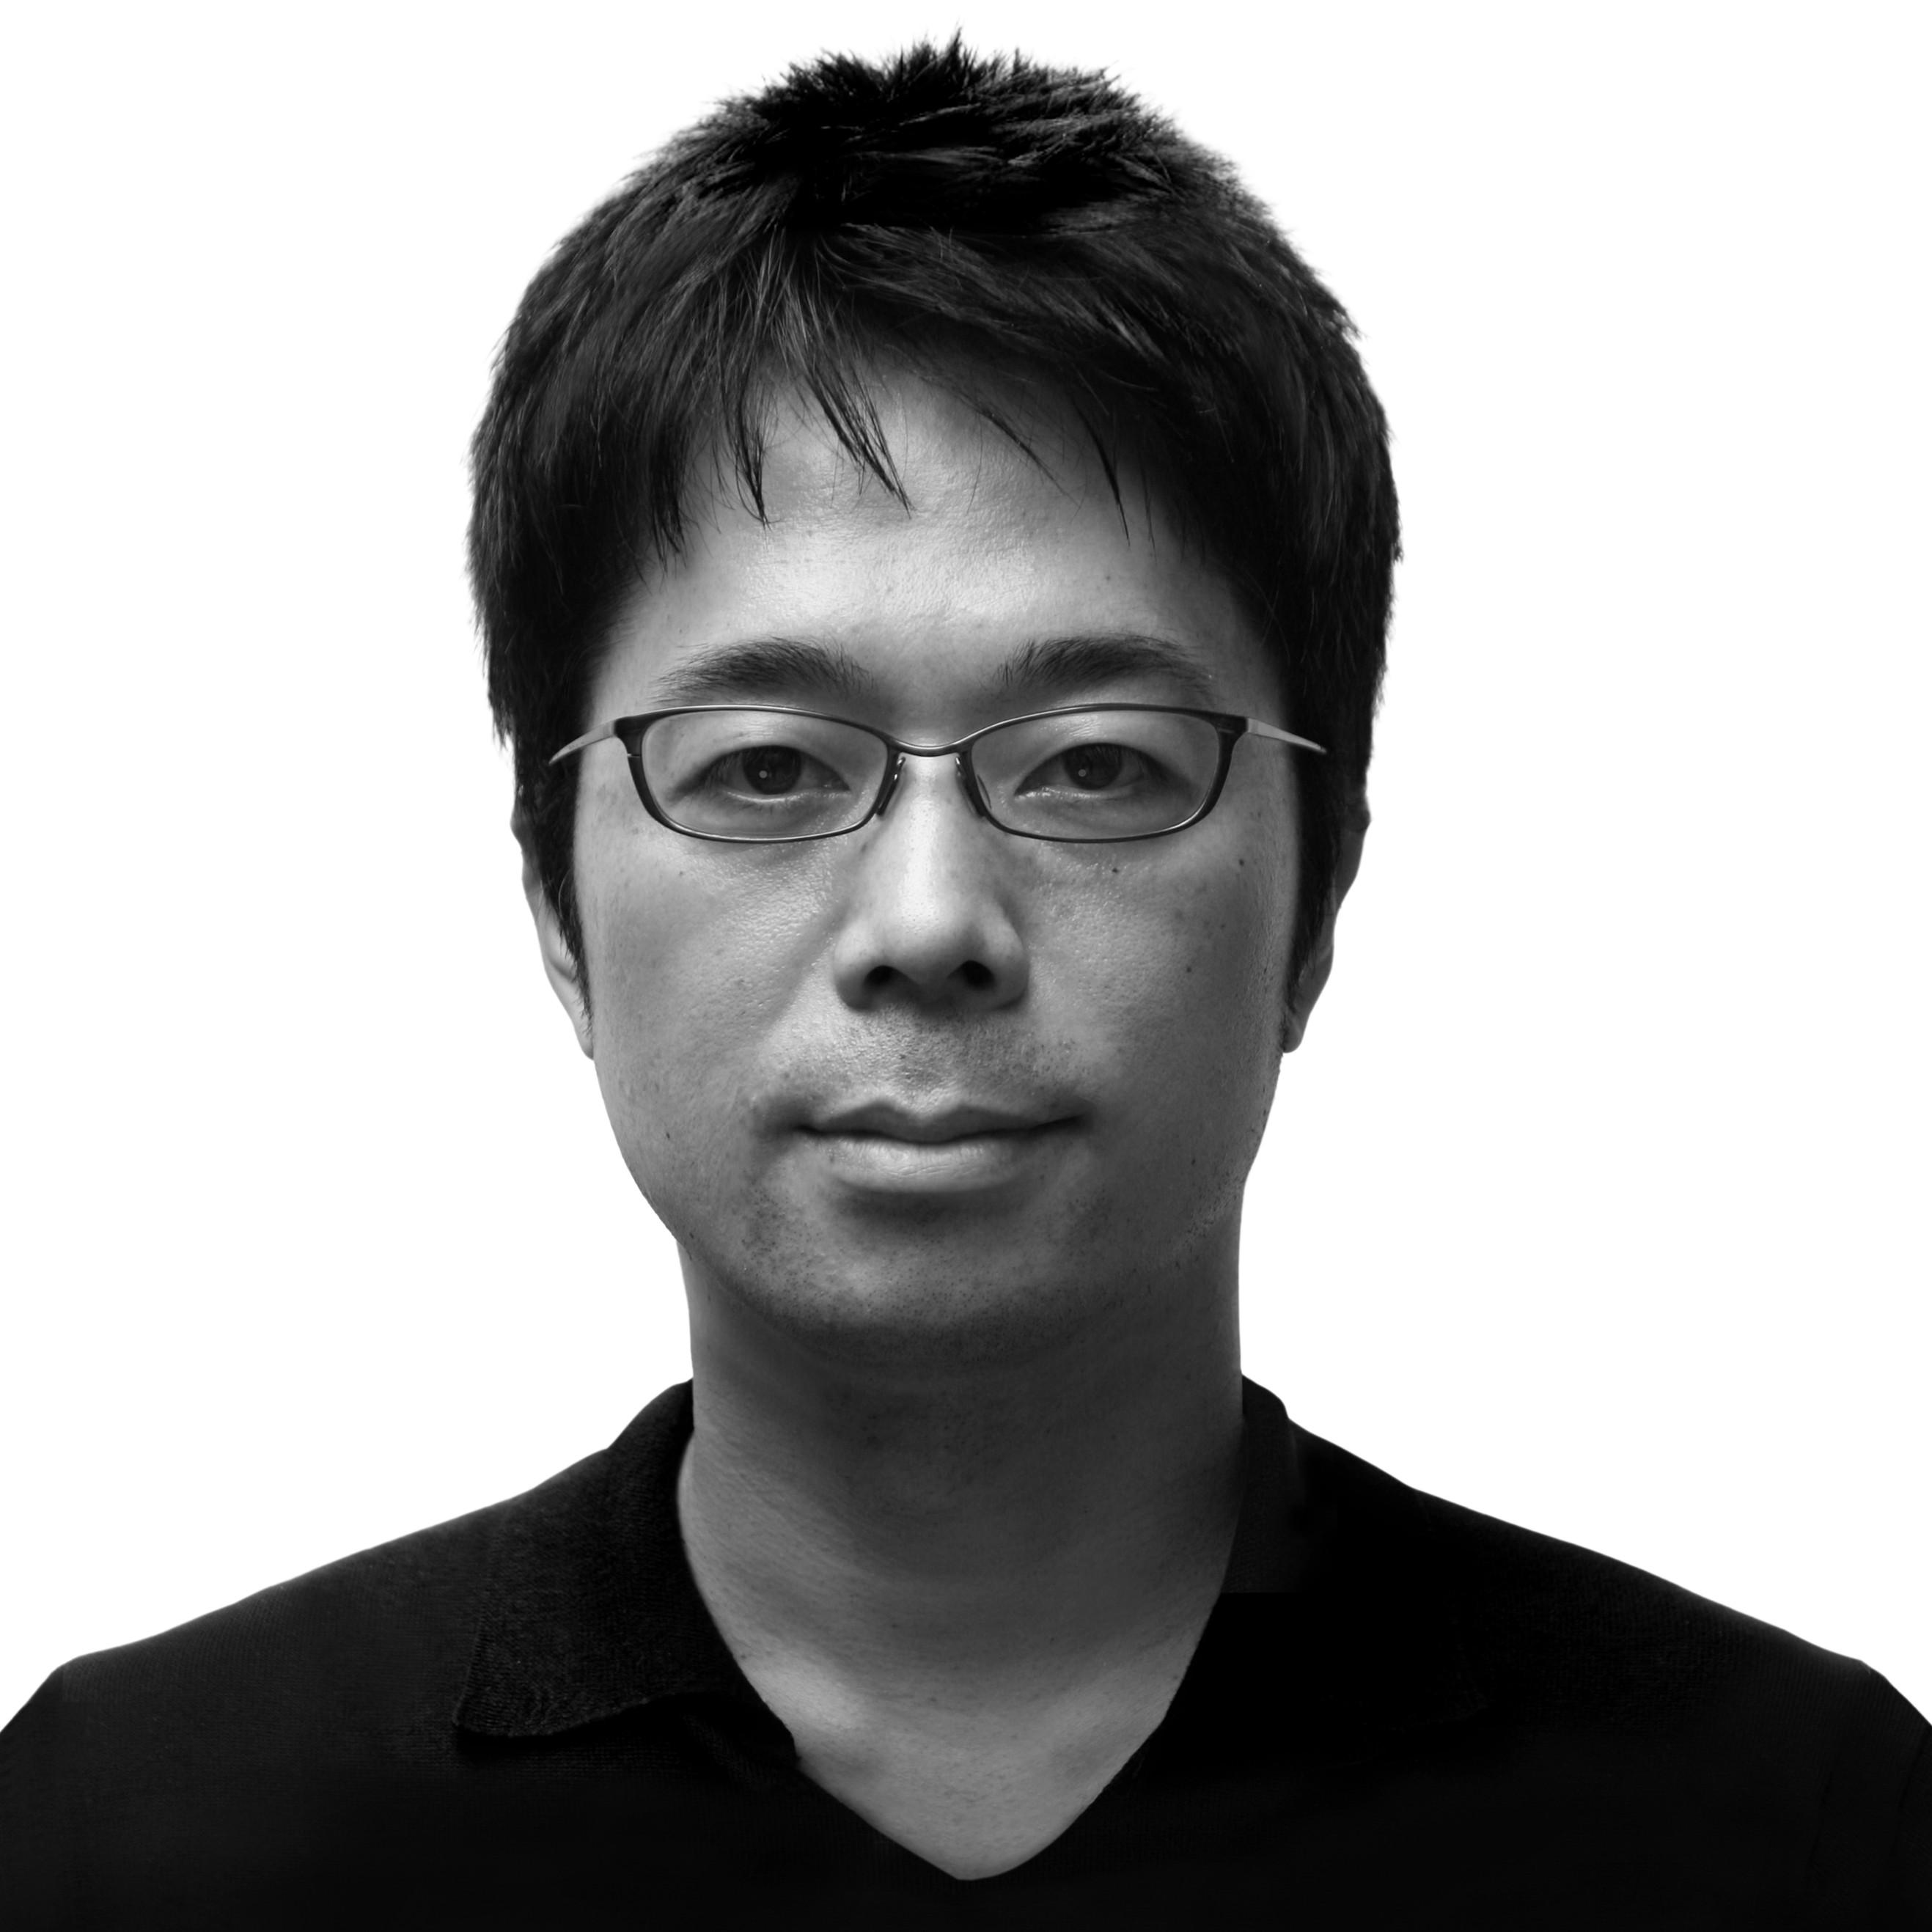 Tokujin Yoshioka Of Lg And Tokujin Yoshioka Celebrate Innovation For A Better